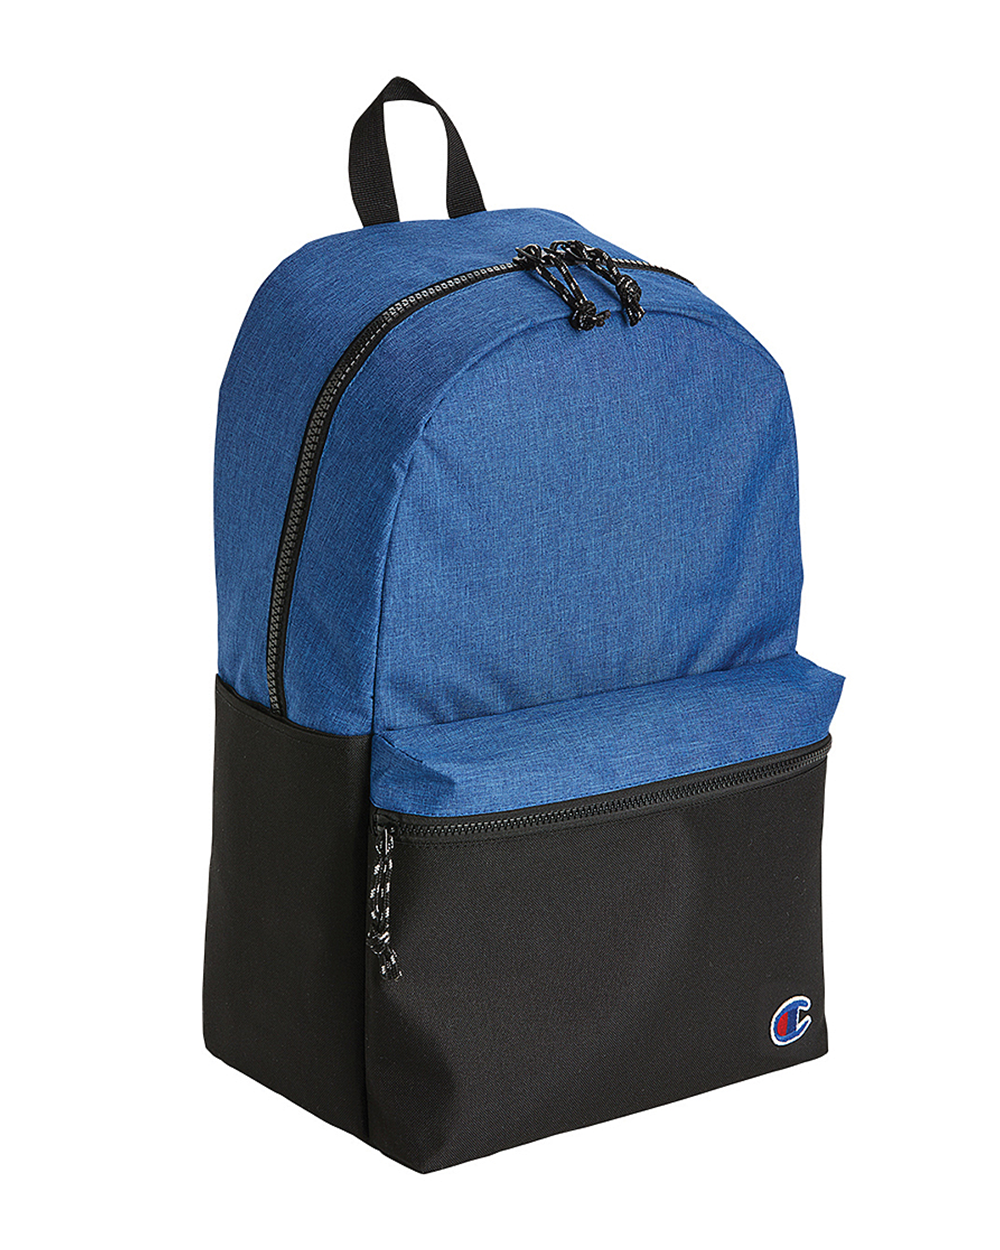 21L Script Backpack